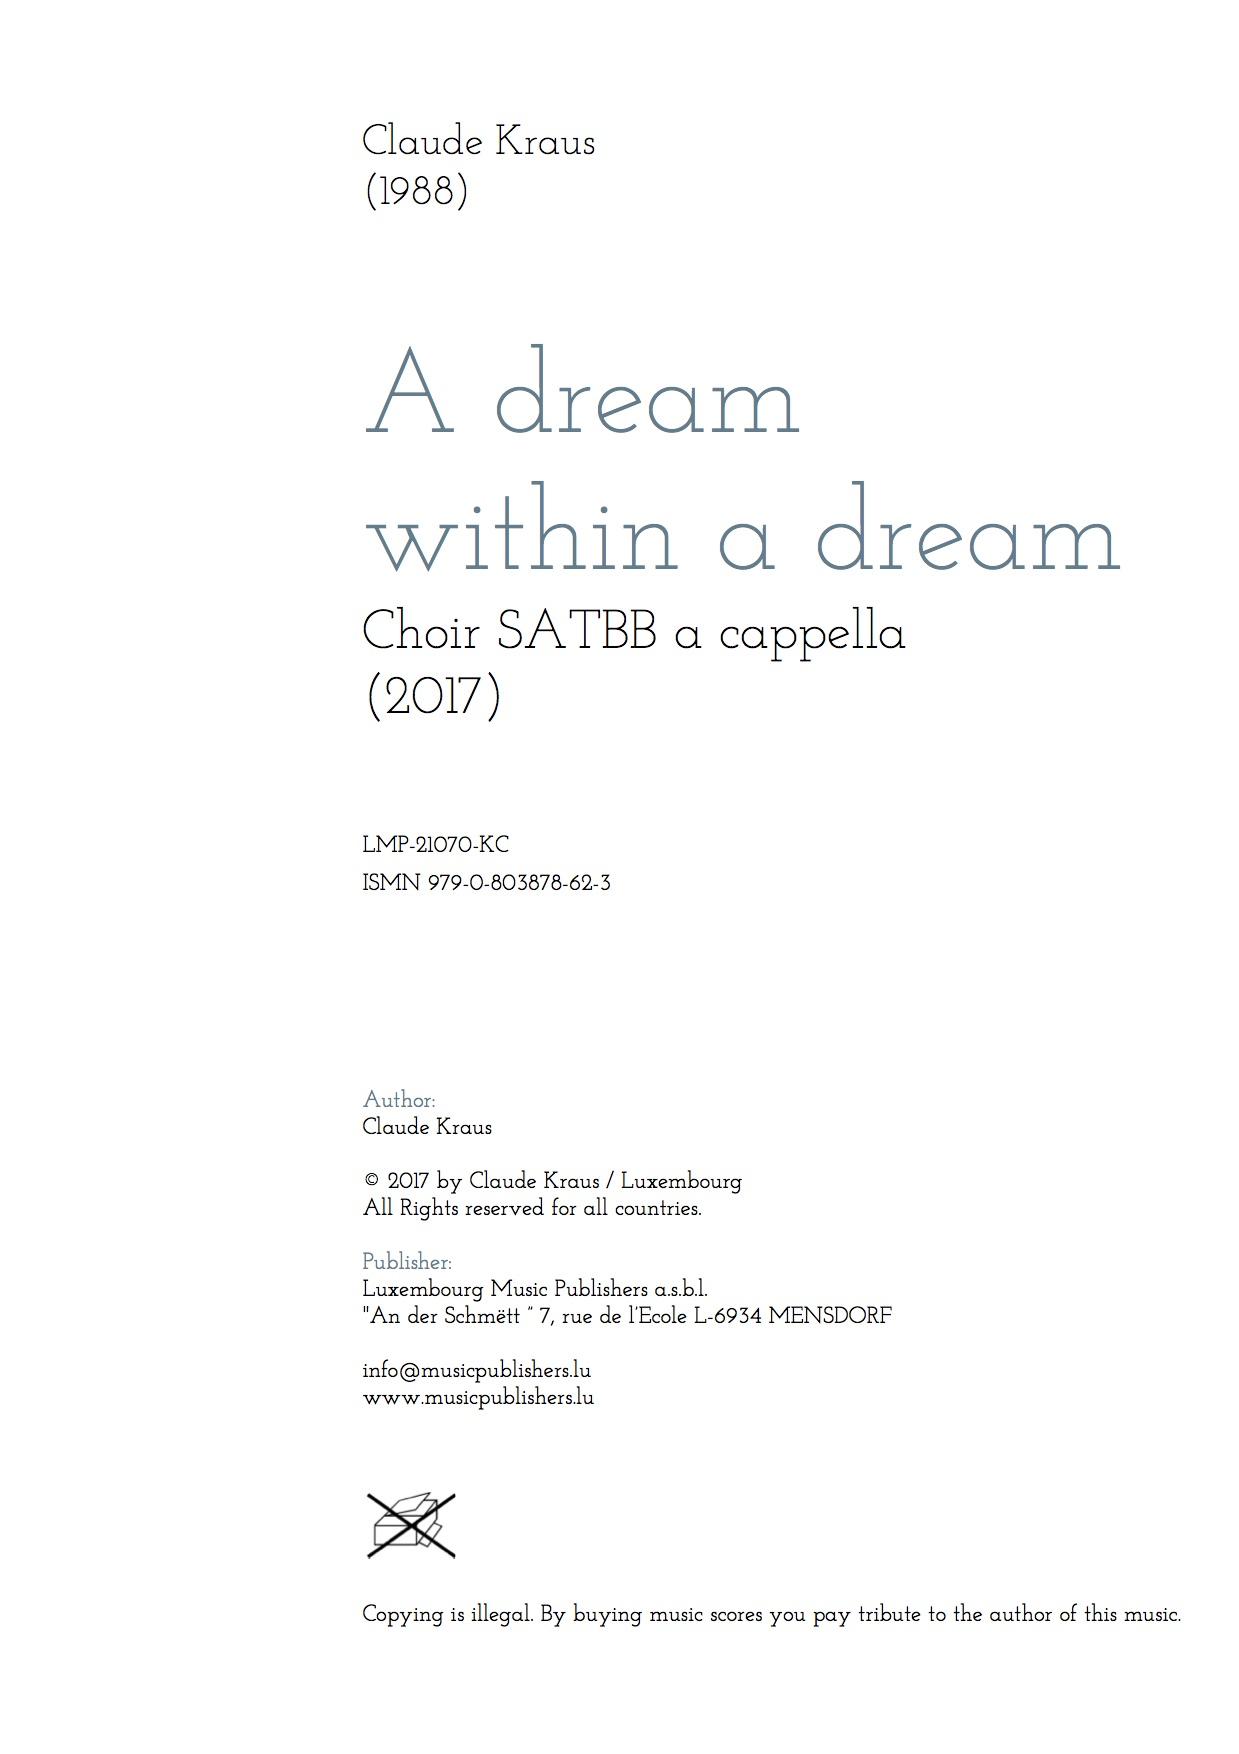 A dream within a dream. Sheet Music by Claude Kraus, composer. A cappella vocal music for Soprano, Alto, Tenor, Bariton and Bass. Choir Music SATBB a cappella. Music for choir a cappella. Text by Edgar Allan Poe.